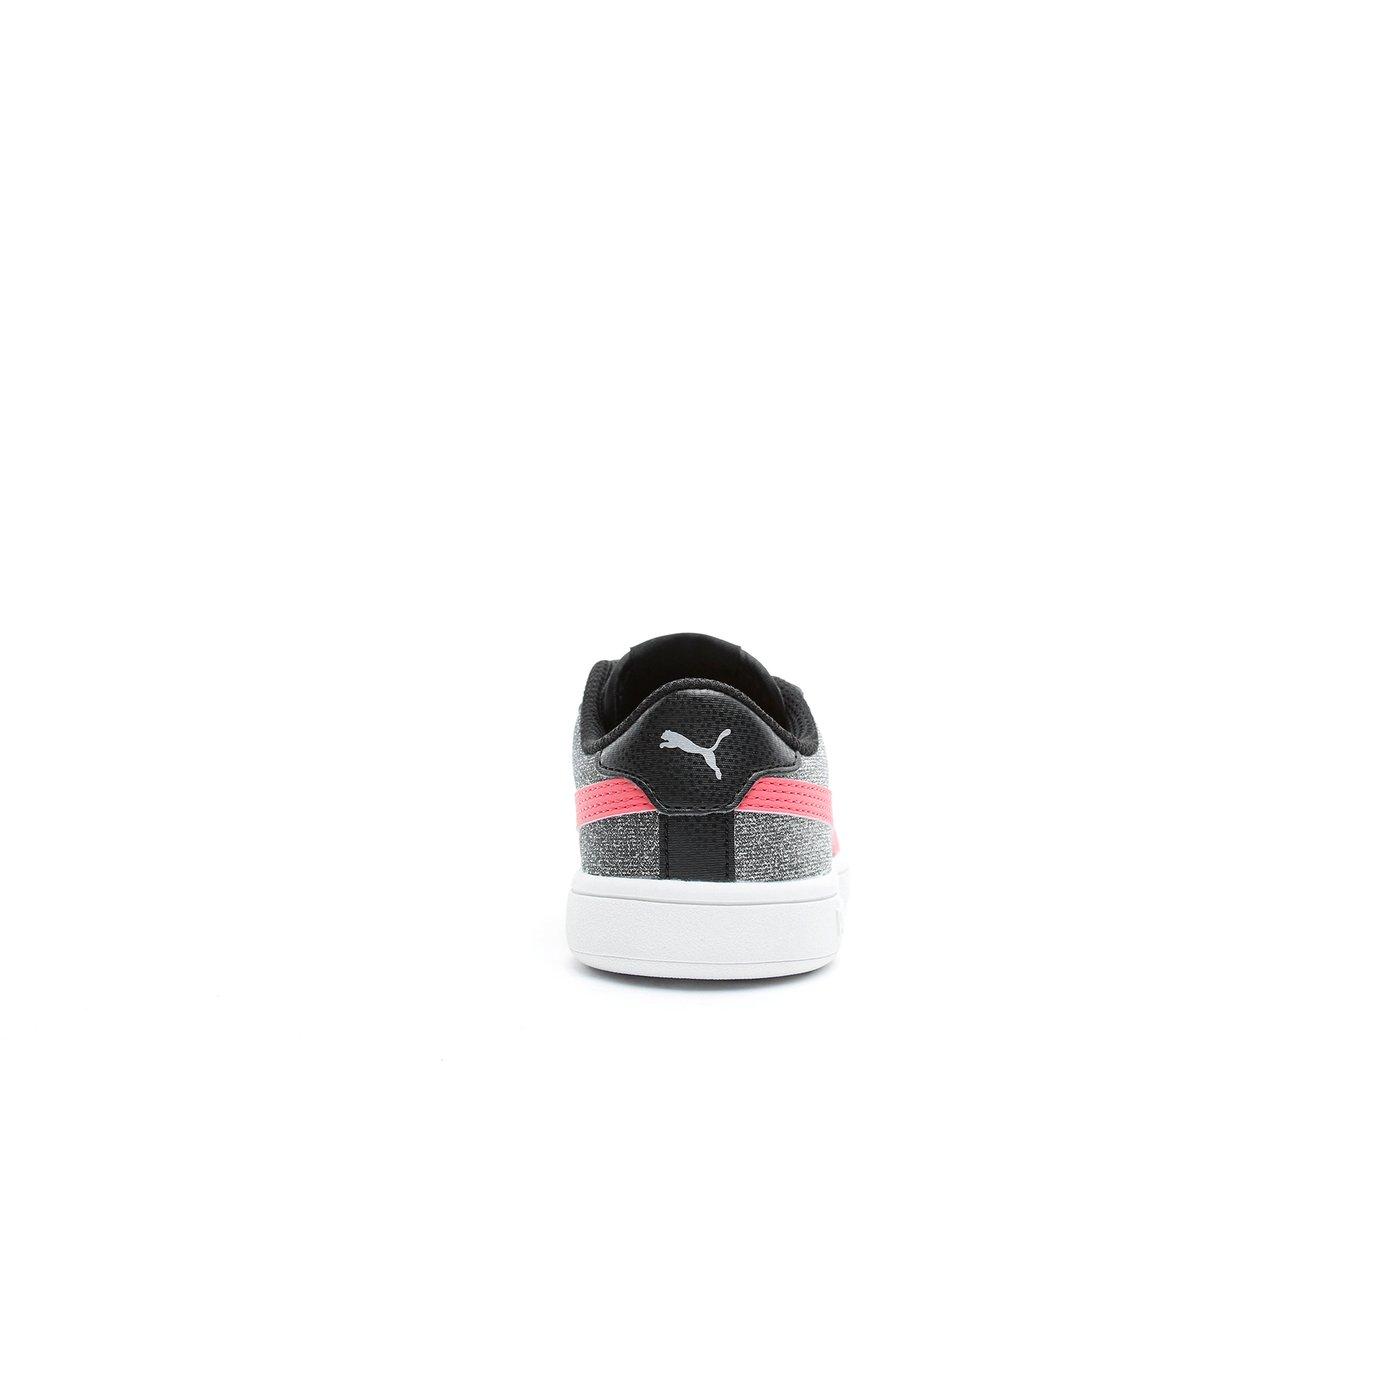 Puma Smash V2 Glitz Glam Çocuk Gri Spor Ayakkabı